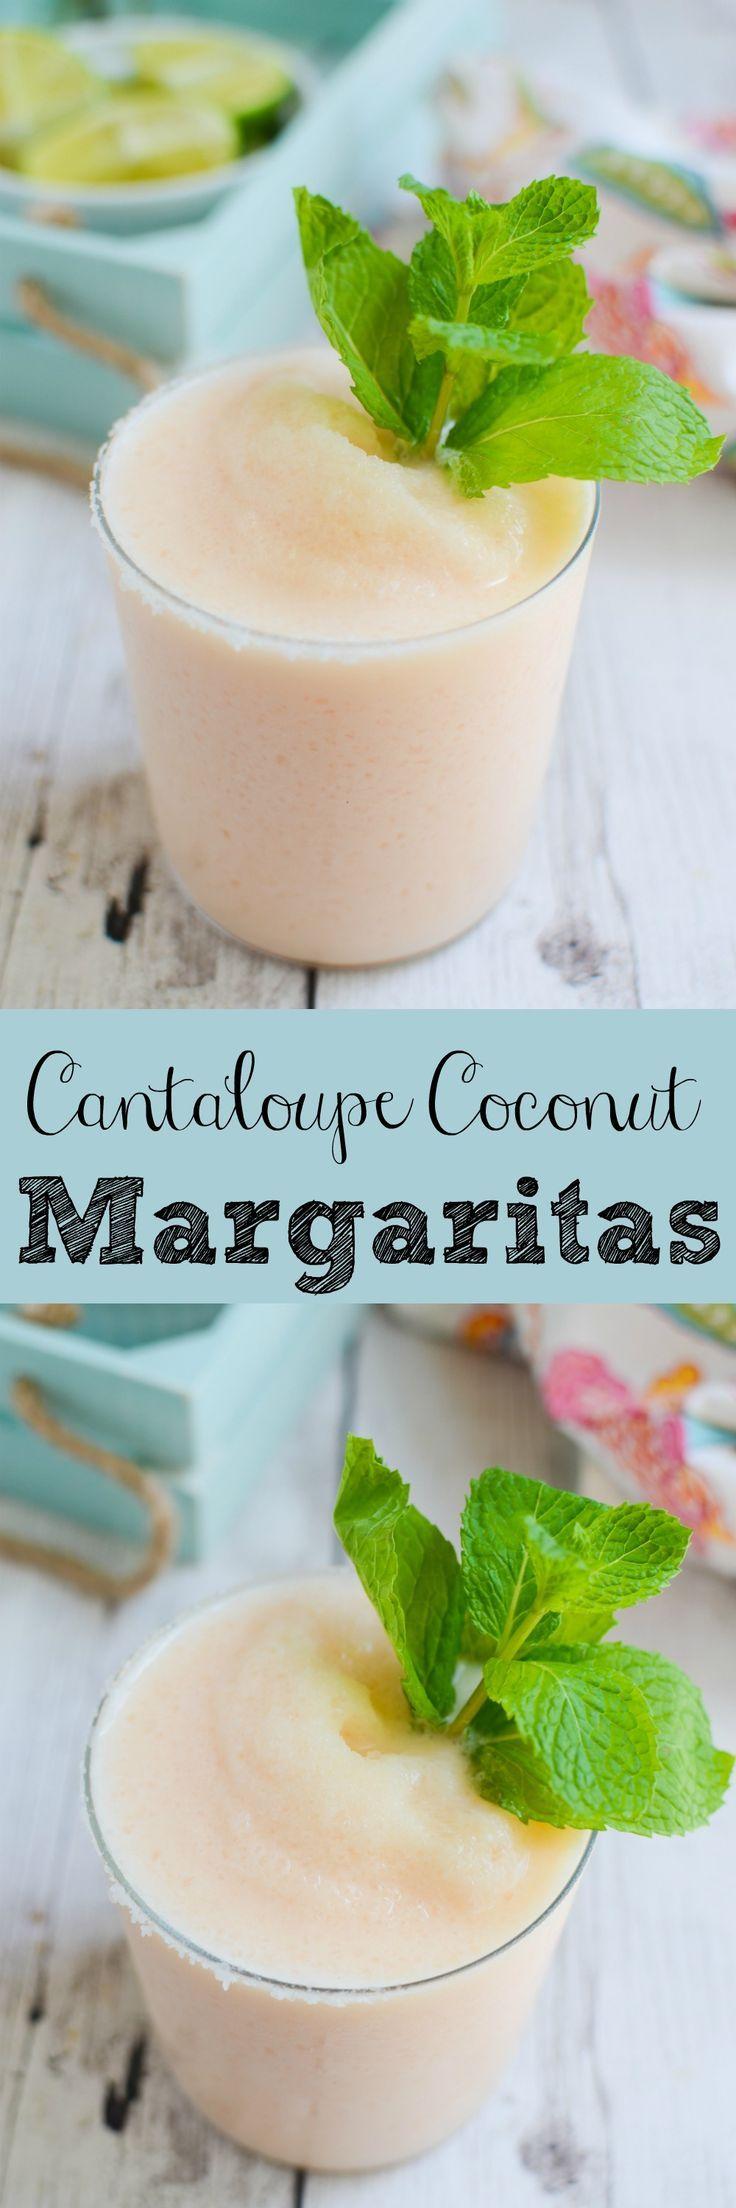 Meer dan 100 Kokosnoot Margarita op Pinterest - Margarita ...